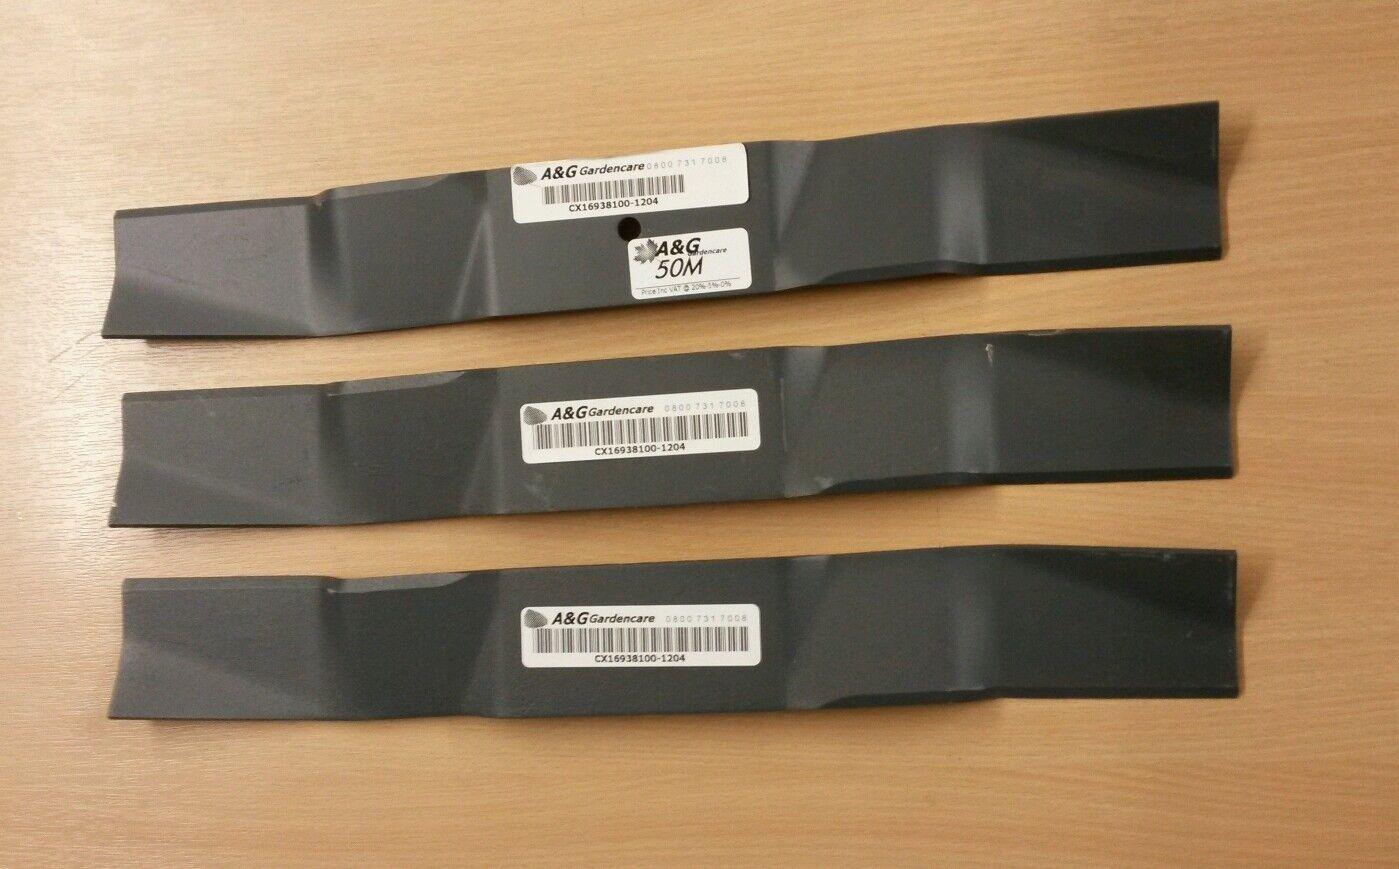 offerta speciale Risparmiatori Countax C300H C400H C600H 38 38 38  LAME trinciatrice PONTE (3) 16937900 - 1202  negozio di moda in vendita